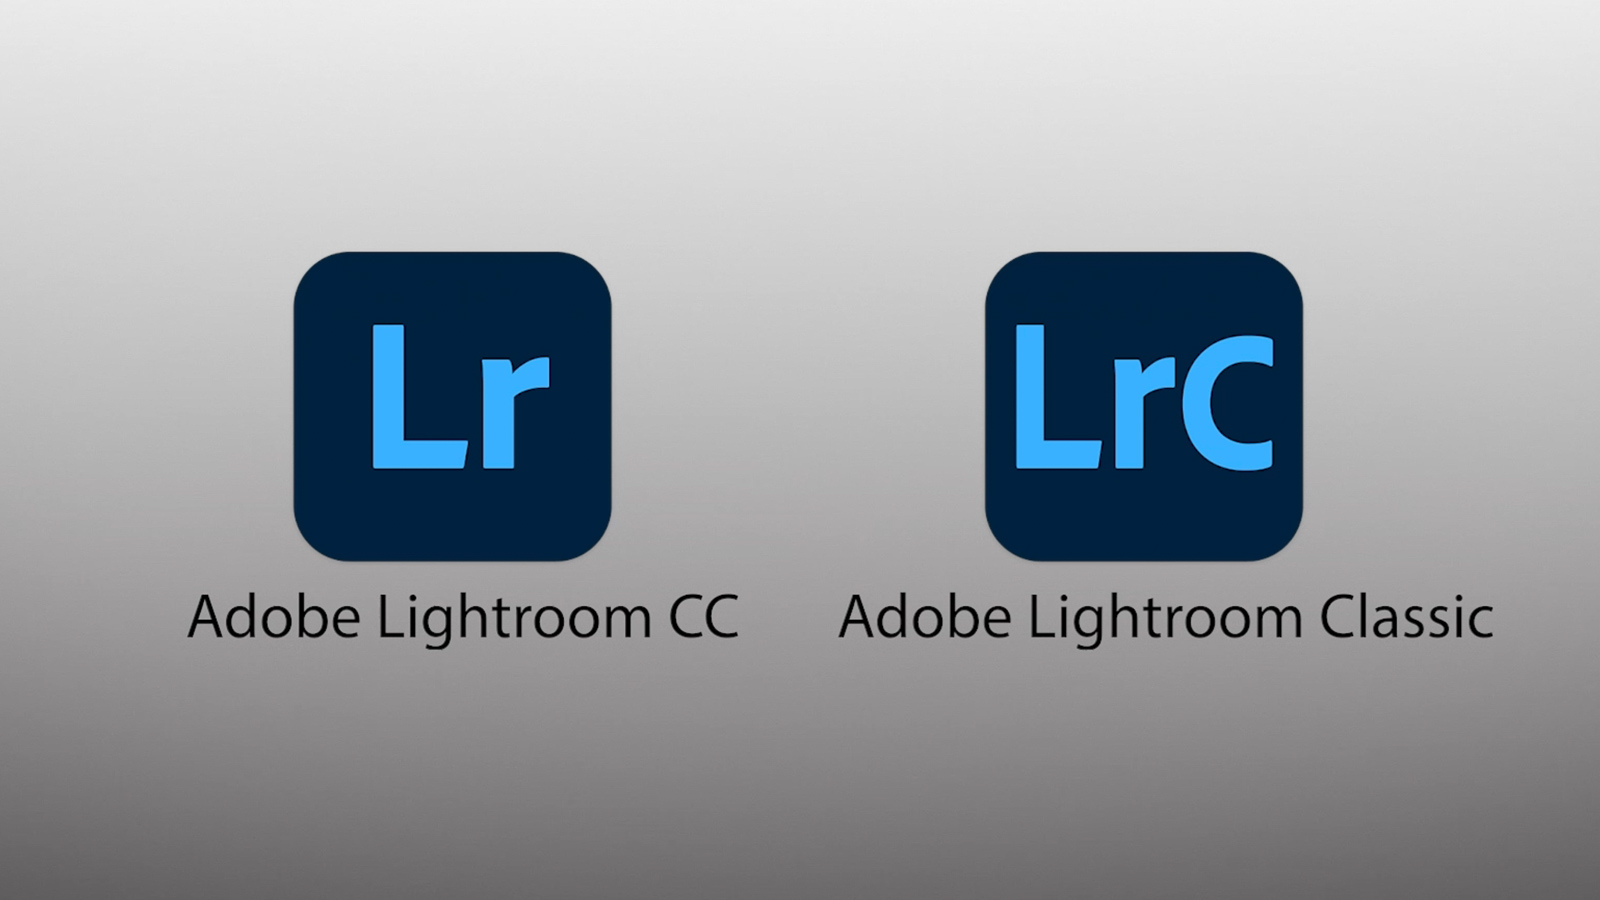 Adobe Lightroom CC - Adobe Lightroom Classic